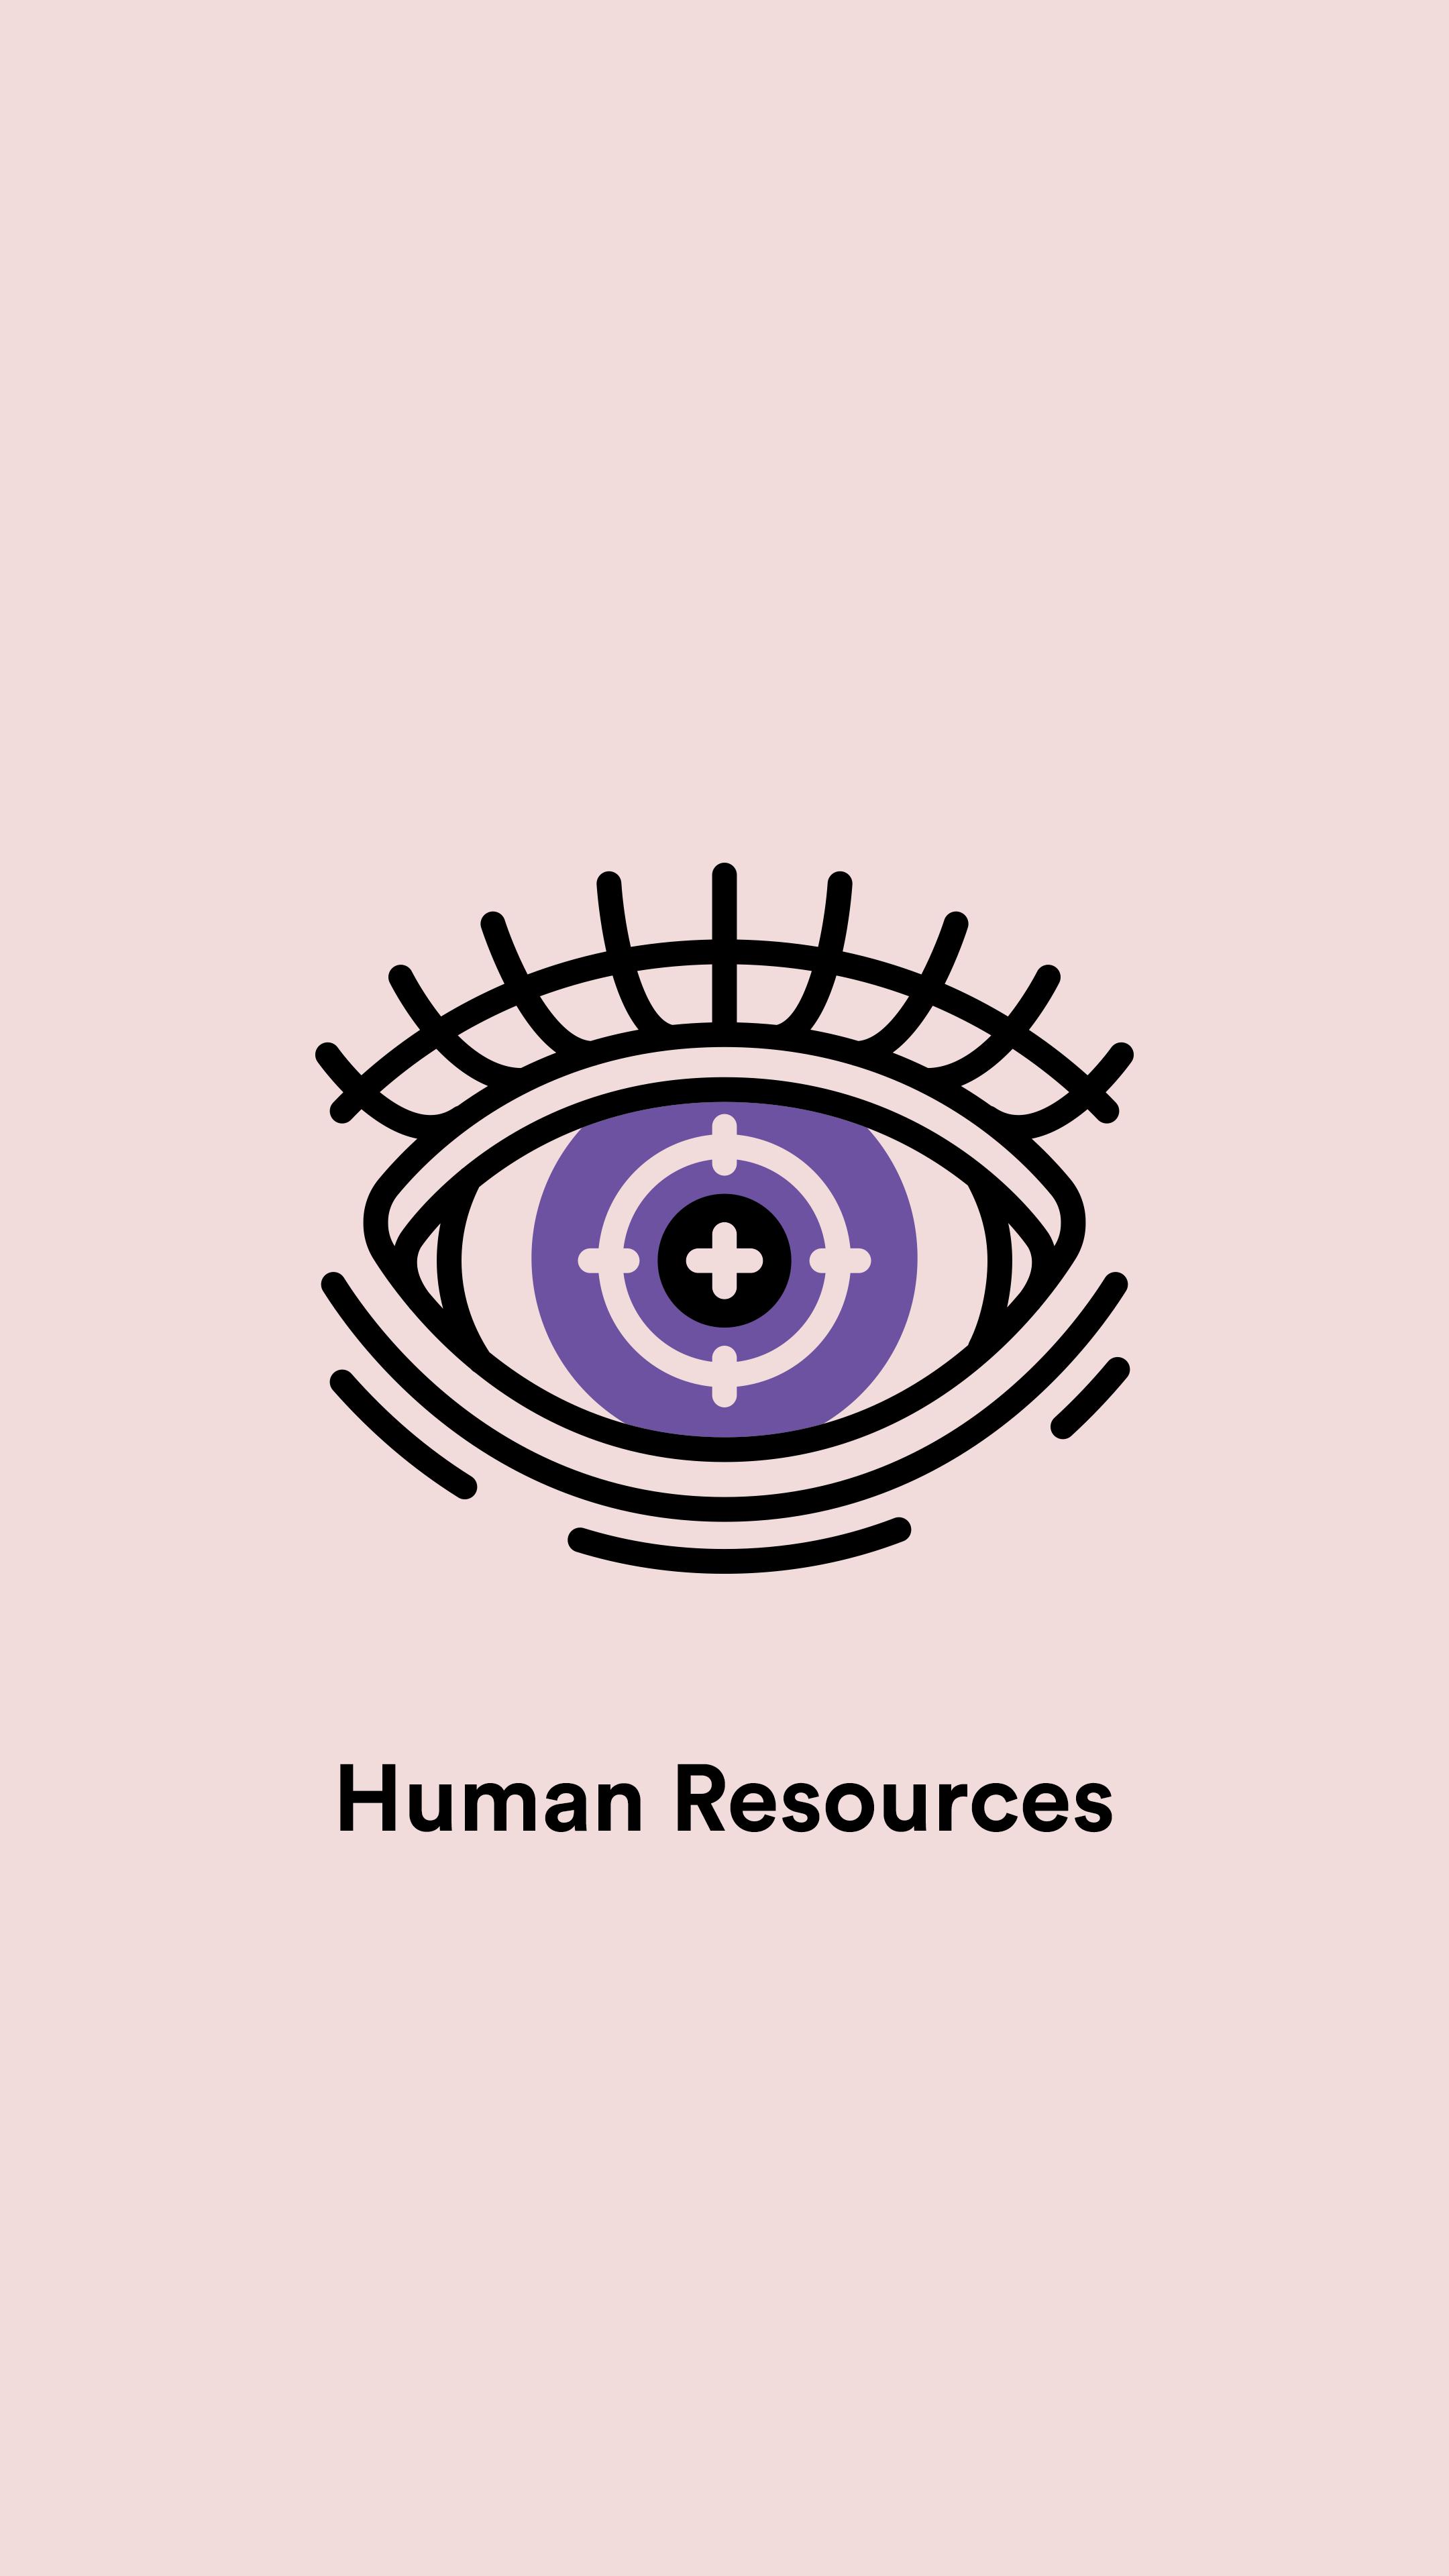 Office Signage For Lola Mullenlowe Paris Illustration Icondesign Hr Humanresources Eye Target Signage Design Signage Design